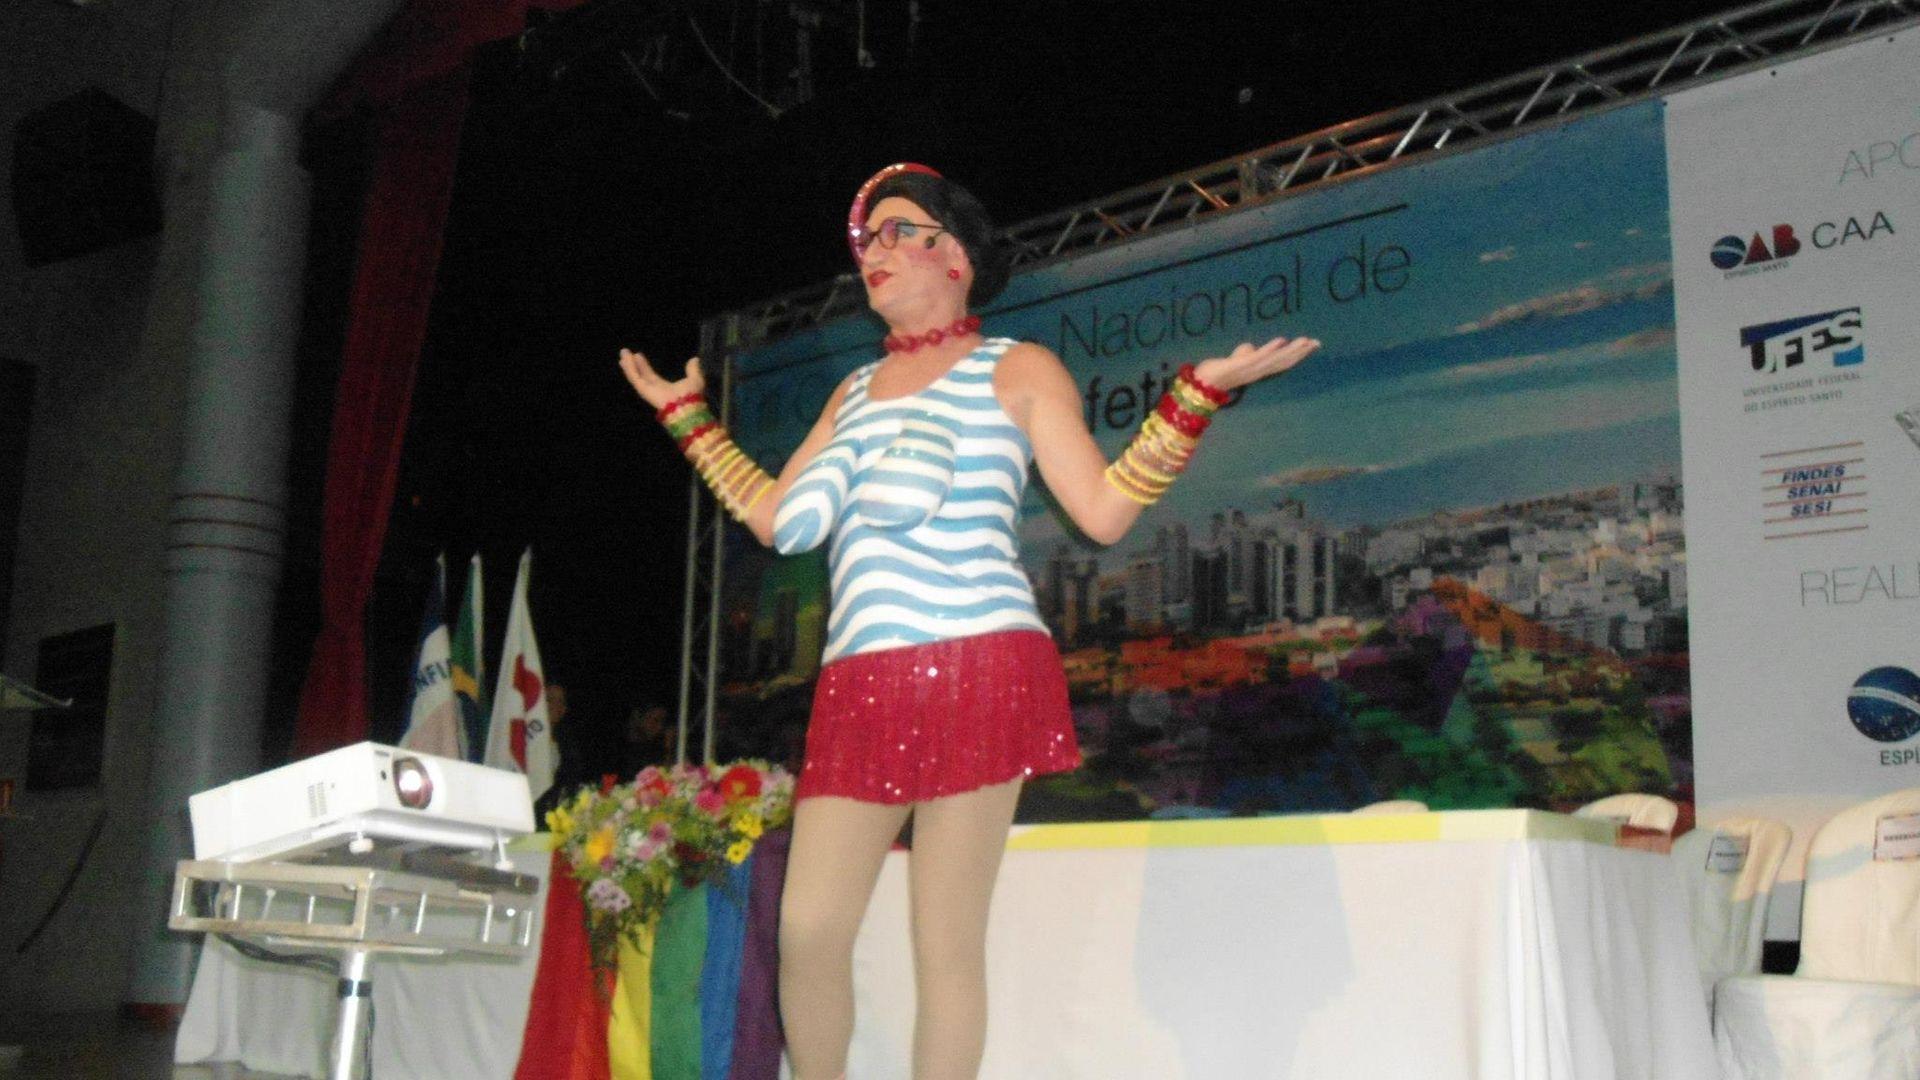 José Luiz Gobbi interpretou a solteirona Marly na peça 'Hello Creuzodete':